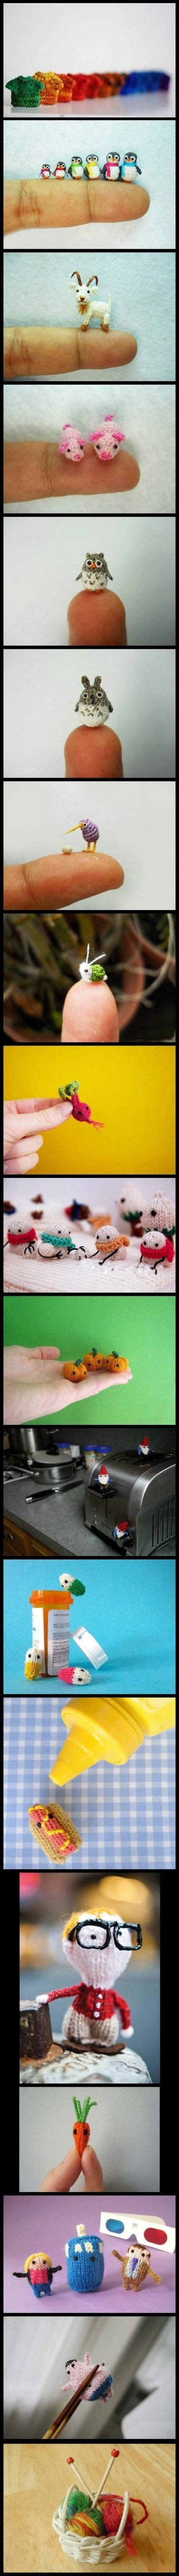 Mikro Amigurumi, Tiere und Puppen